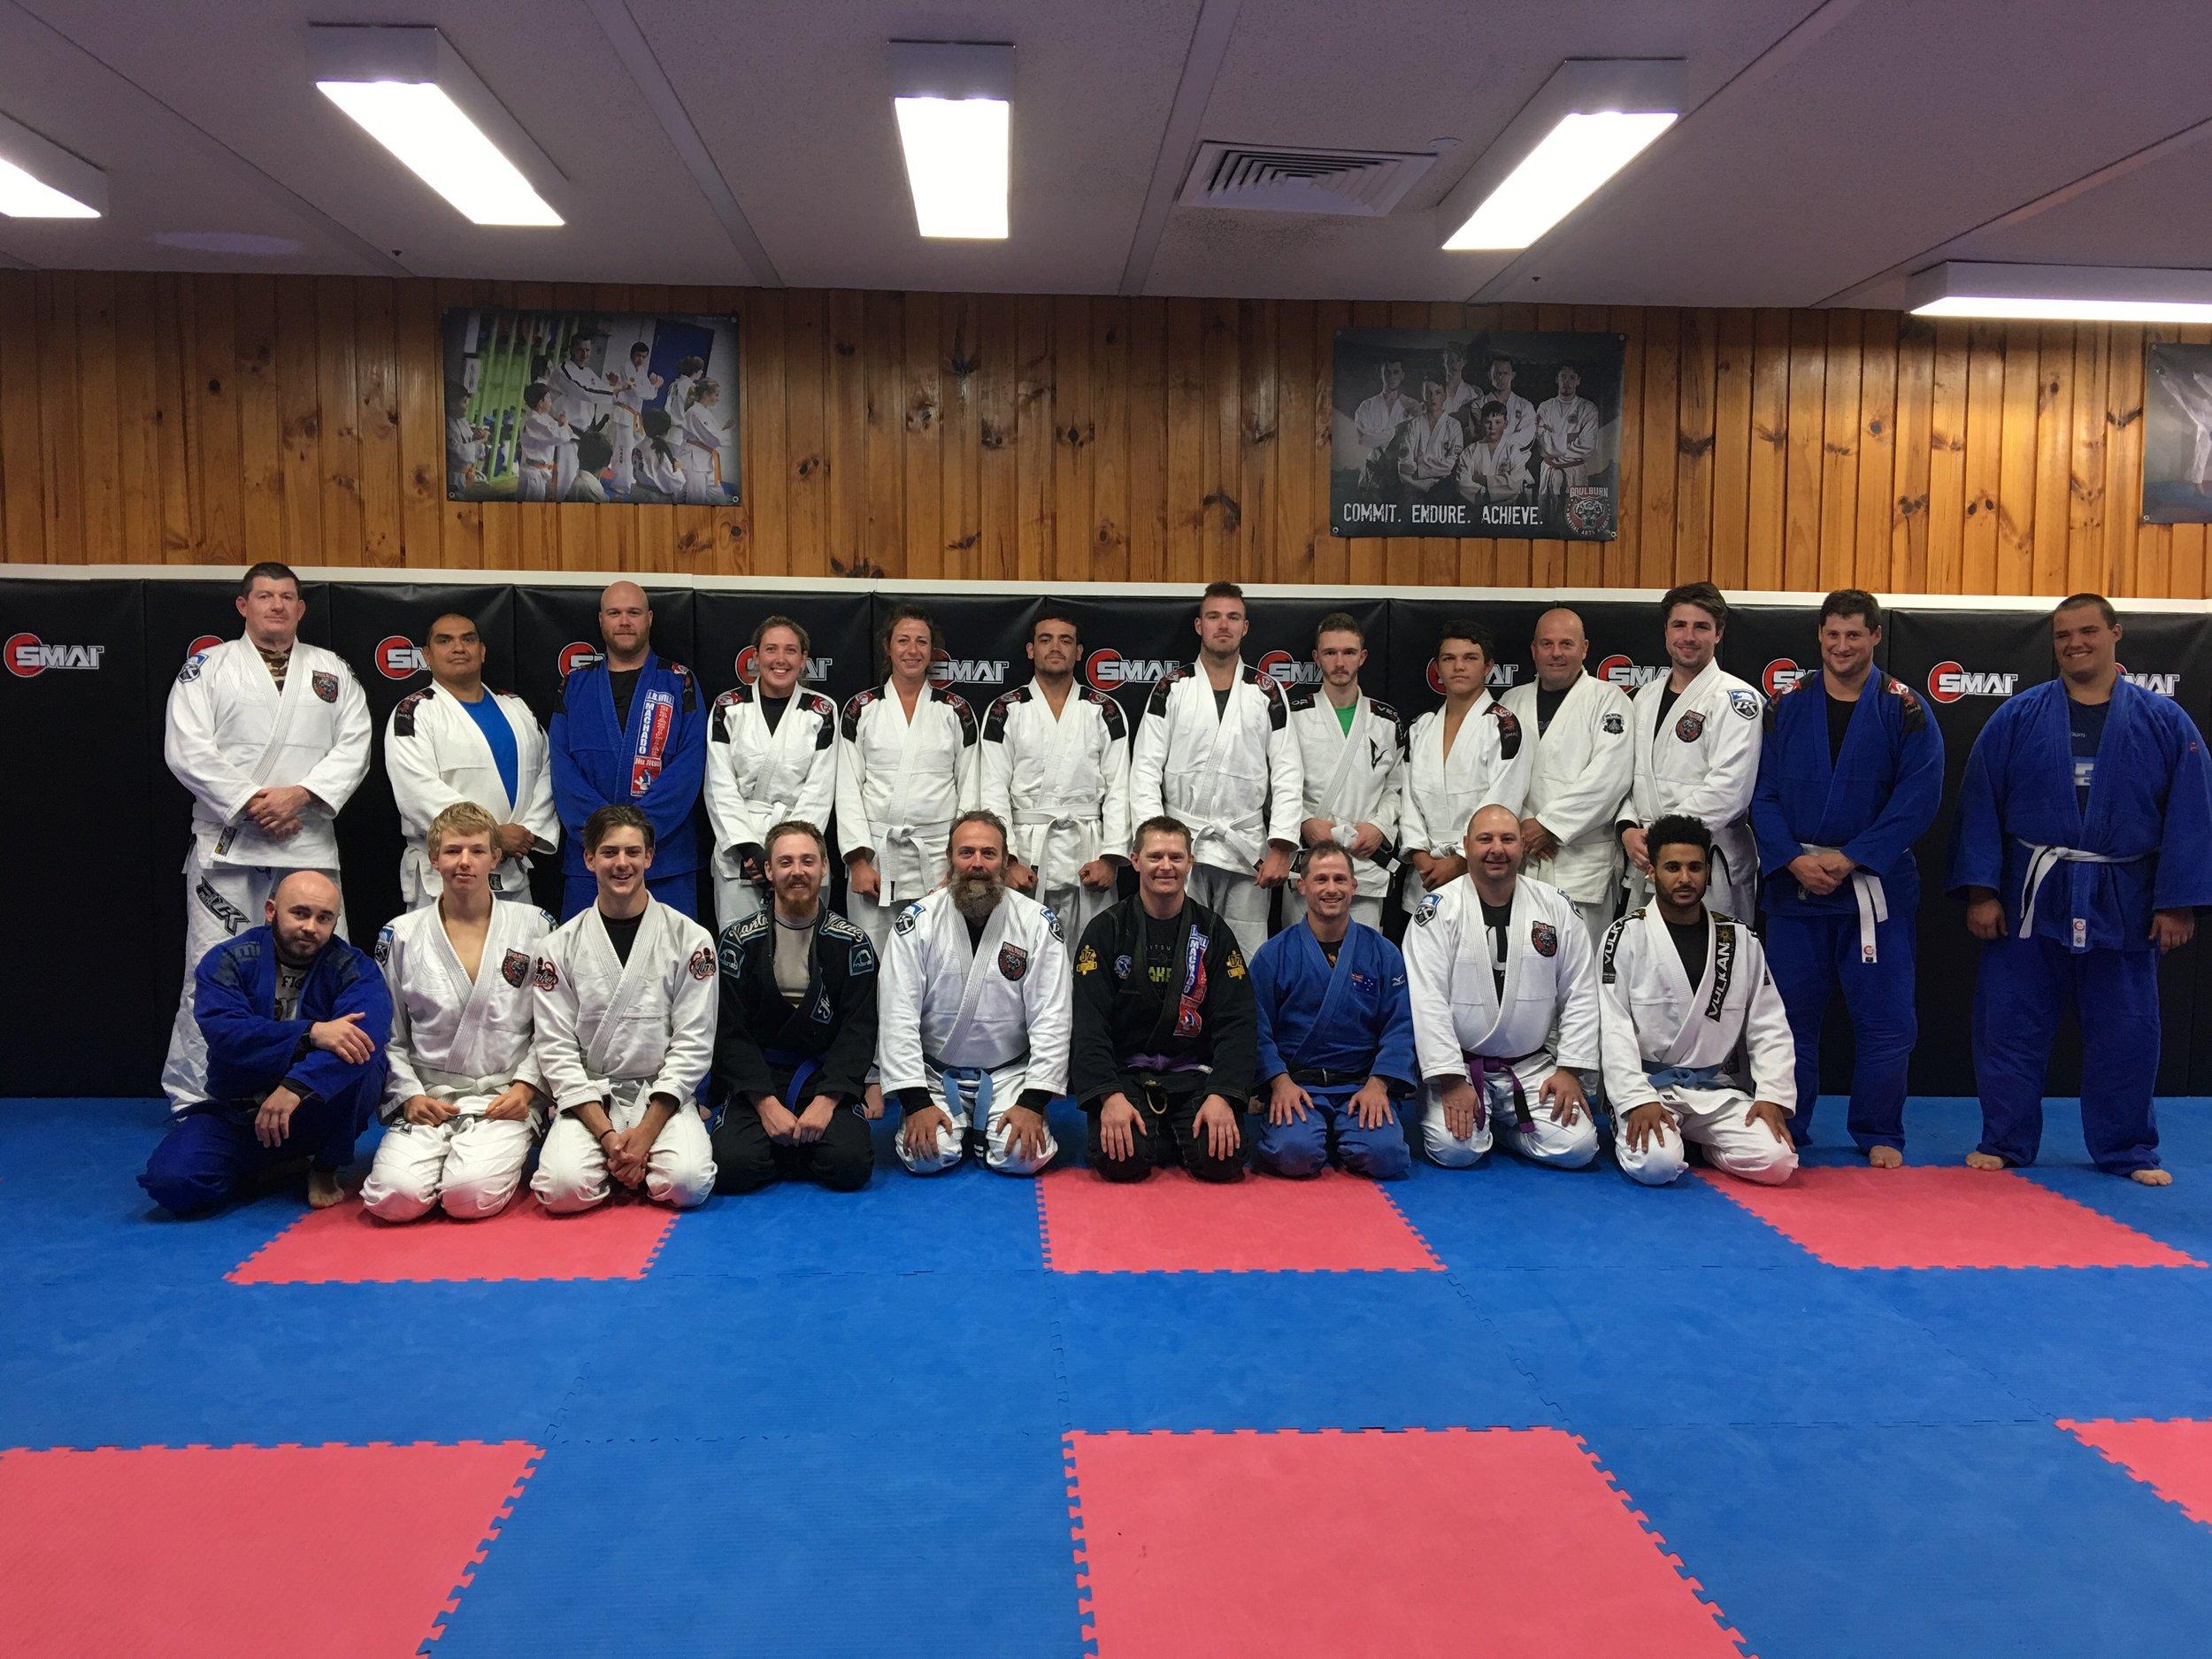 Team GMAA with Matt Daquino Judo Olympian